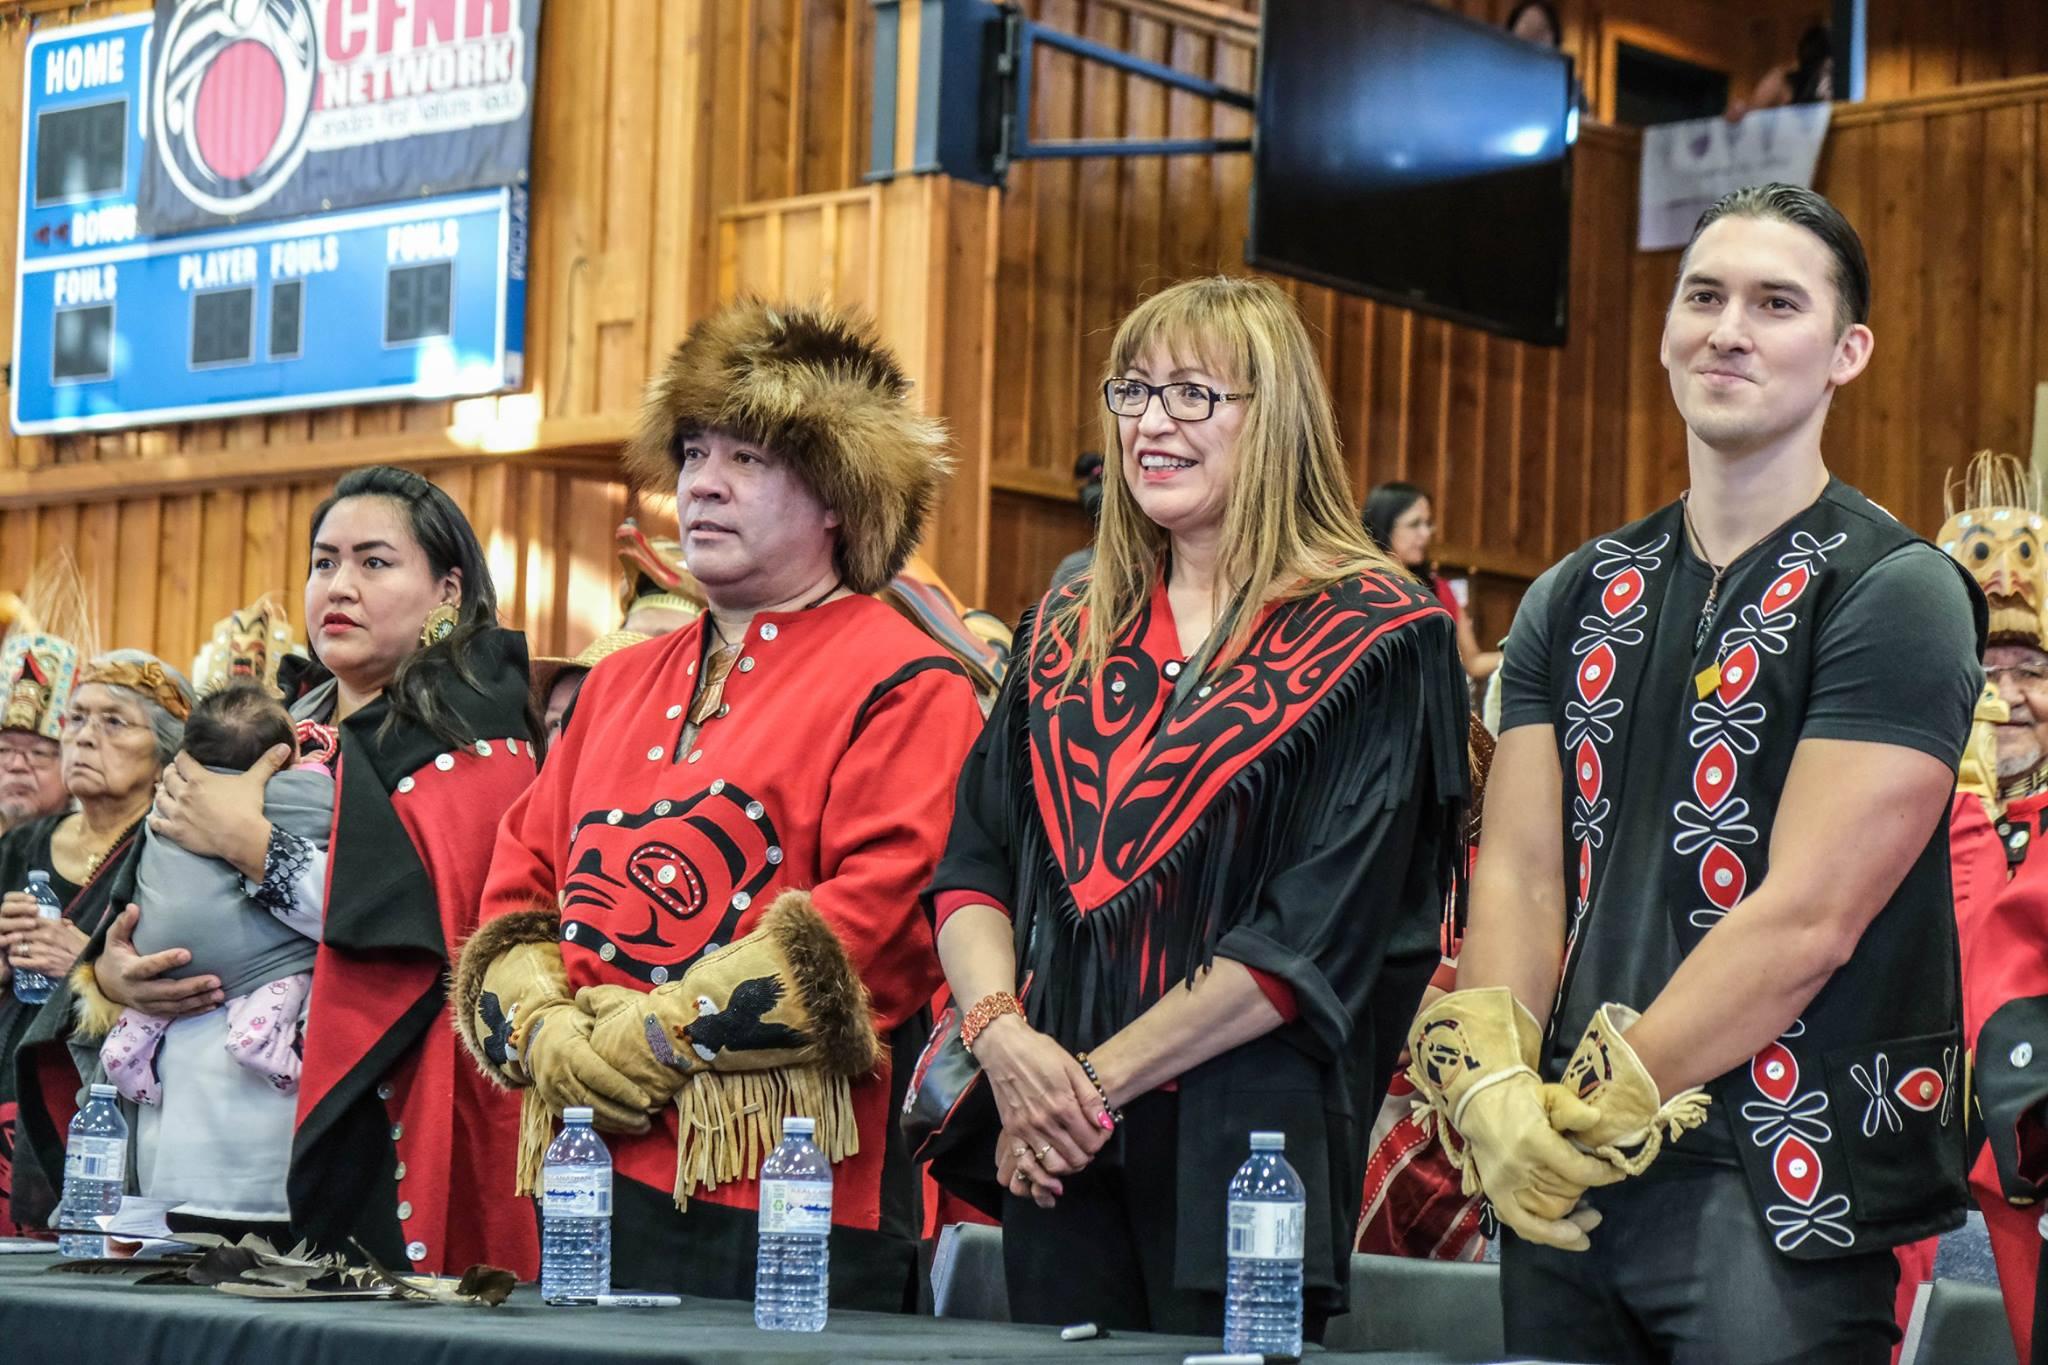 Tahltan & Nisga'a Nation To Nation Alliance